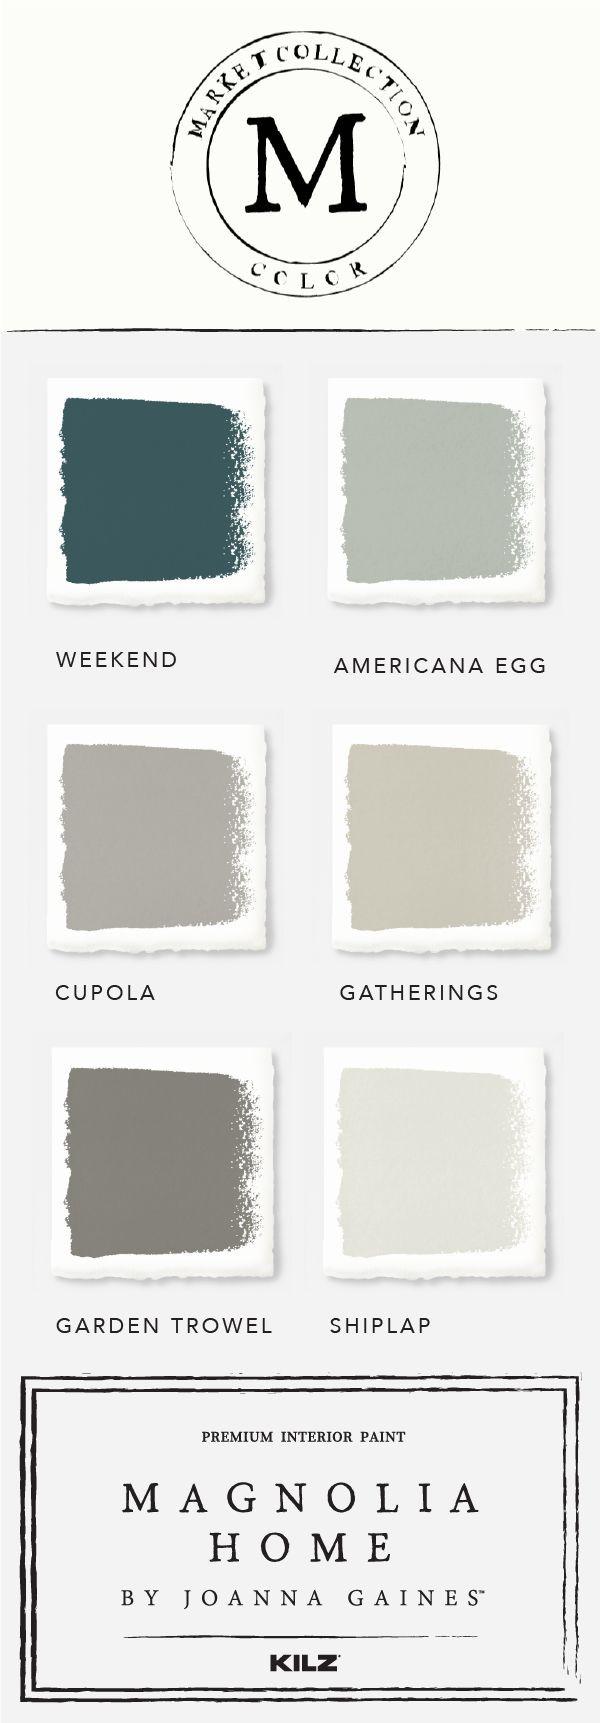 Best ideas about Magnolia Paint Colors . Save or Pin 25 best ideas about Magnolia Home Decor on Pinterest Now.